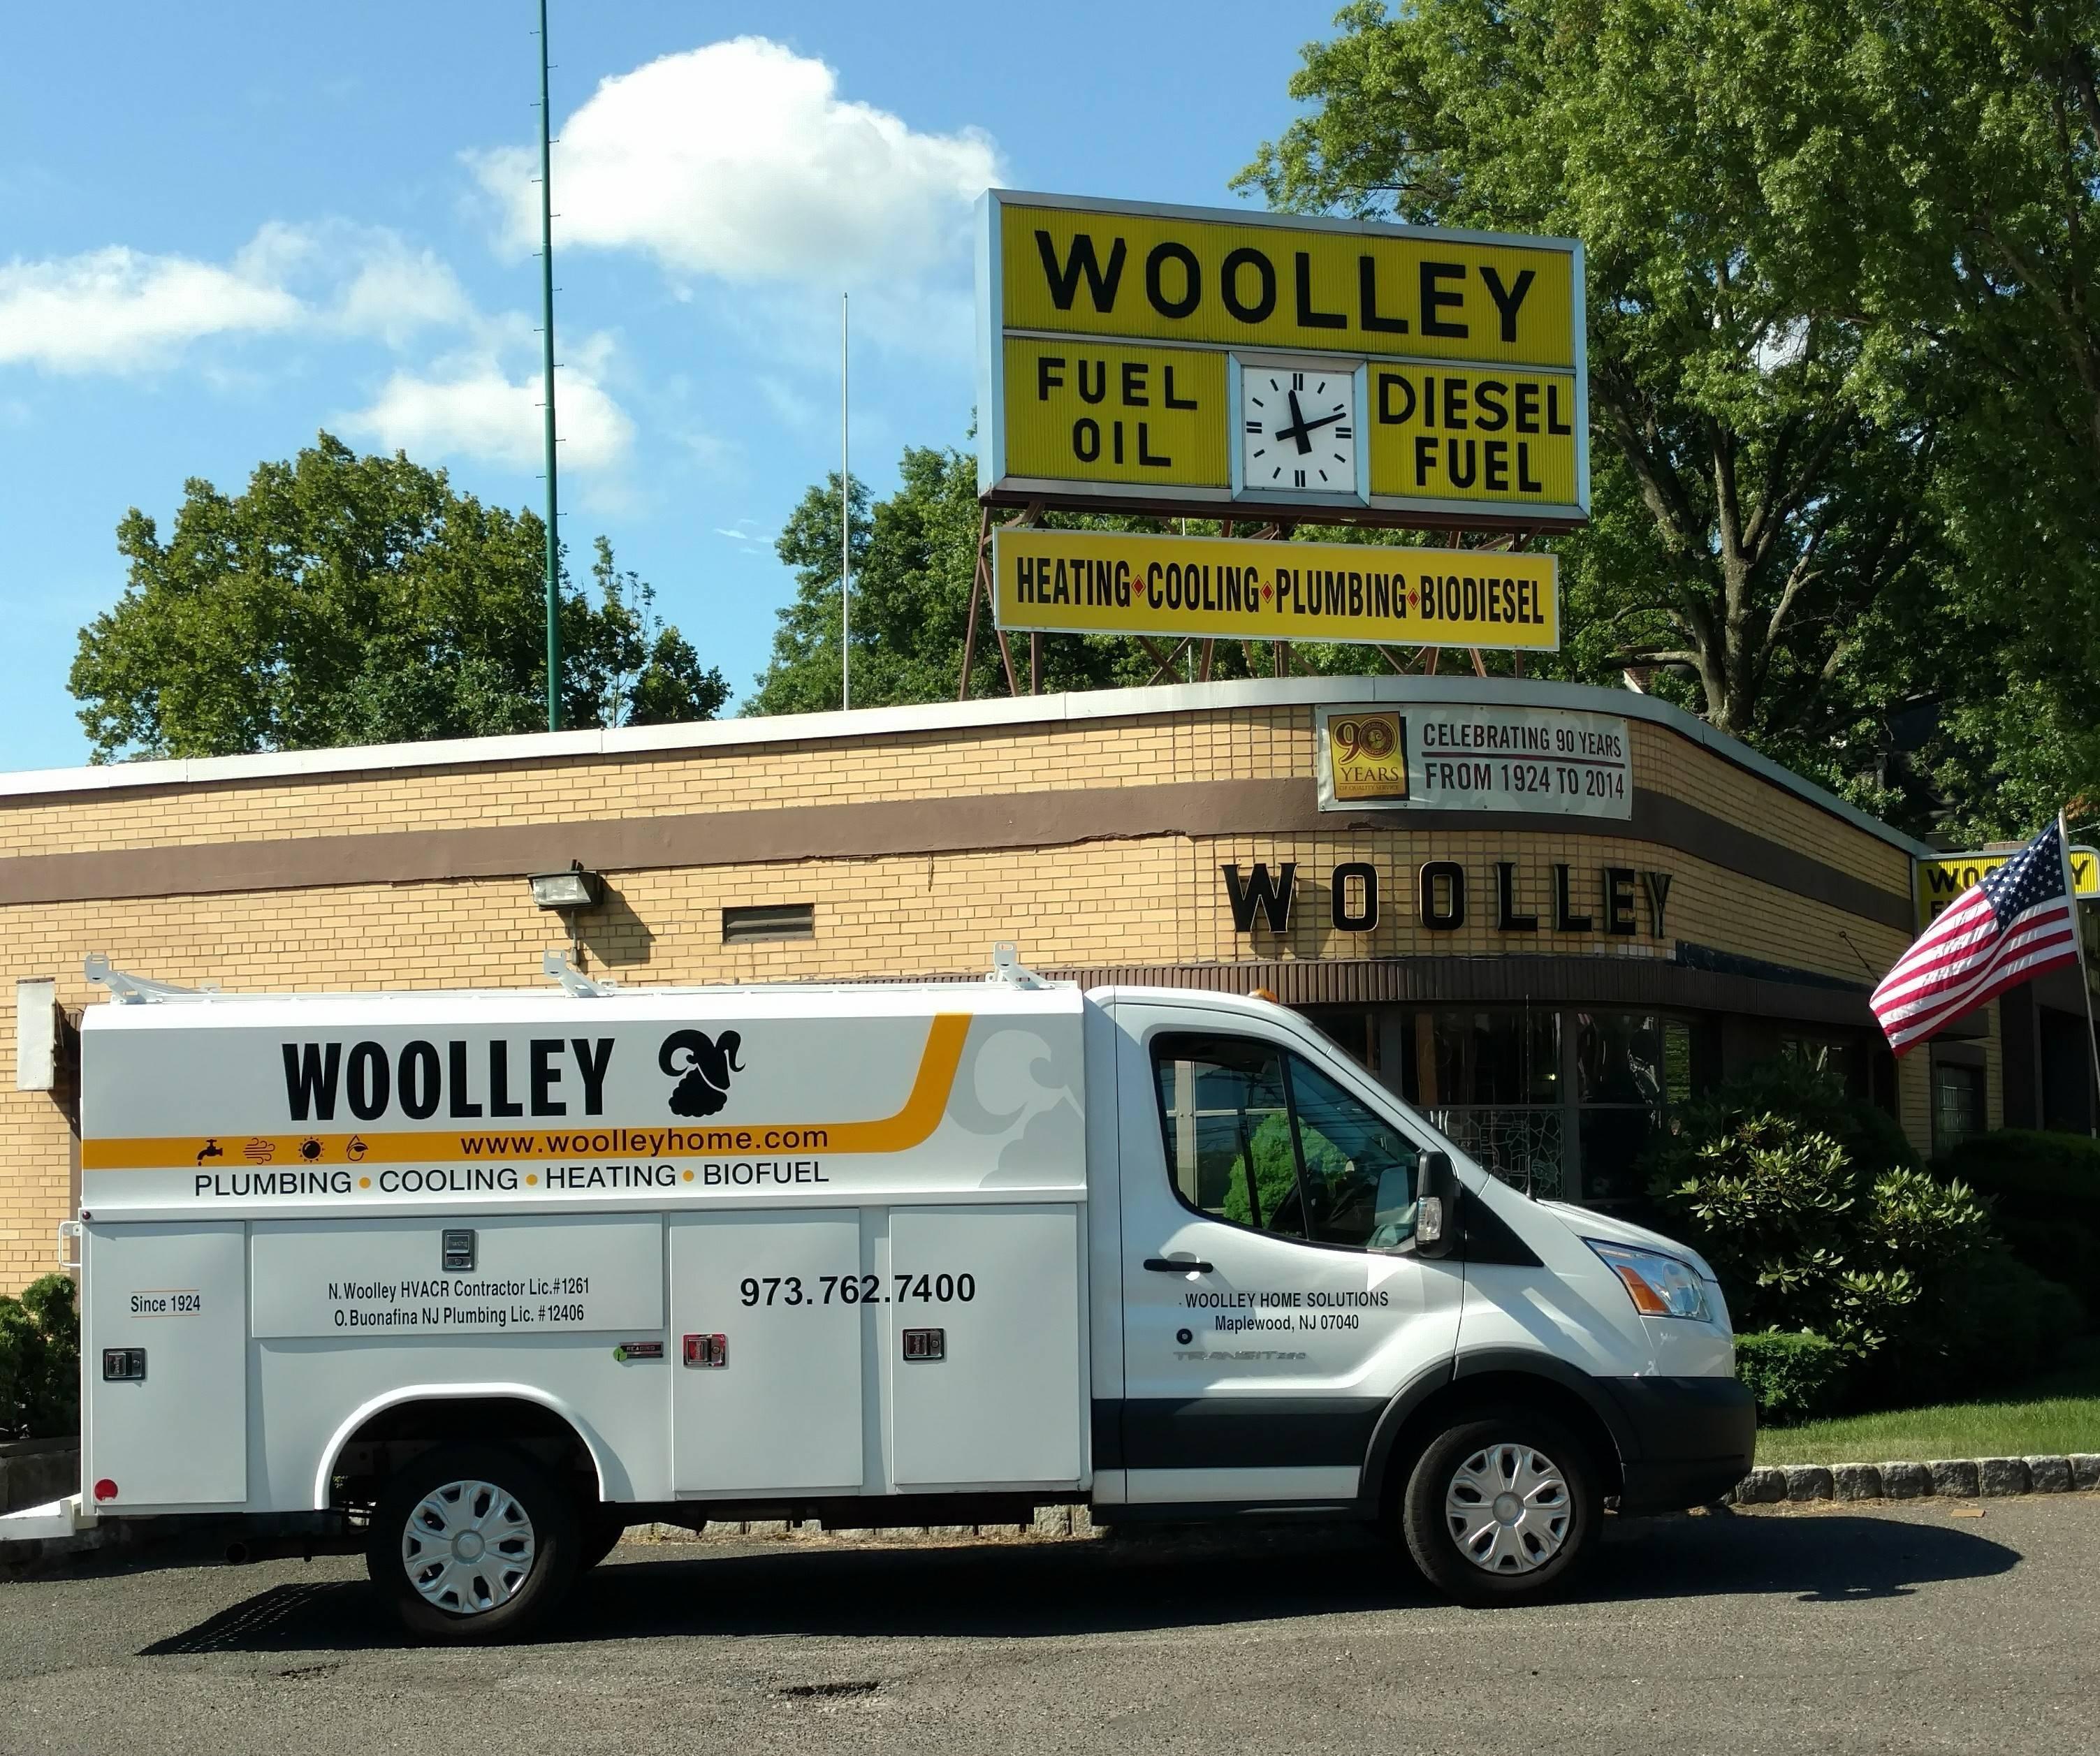 a8b922938a27b4c9dc41_woolley_plumbing_truck.jpg